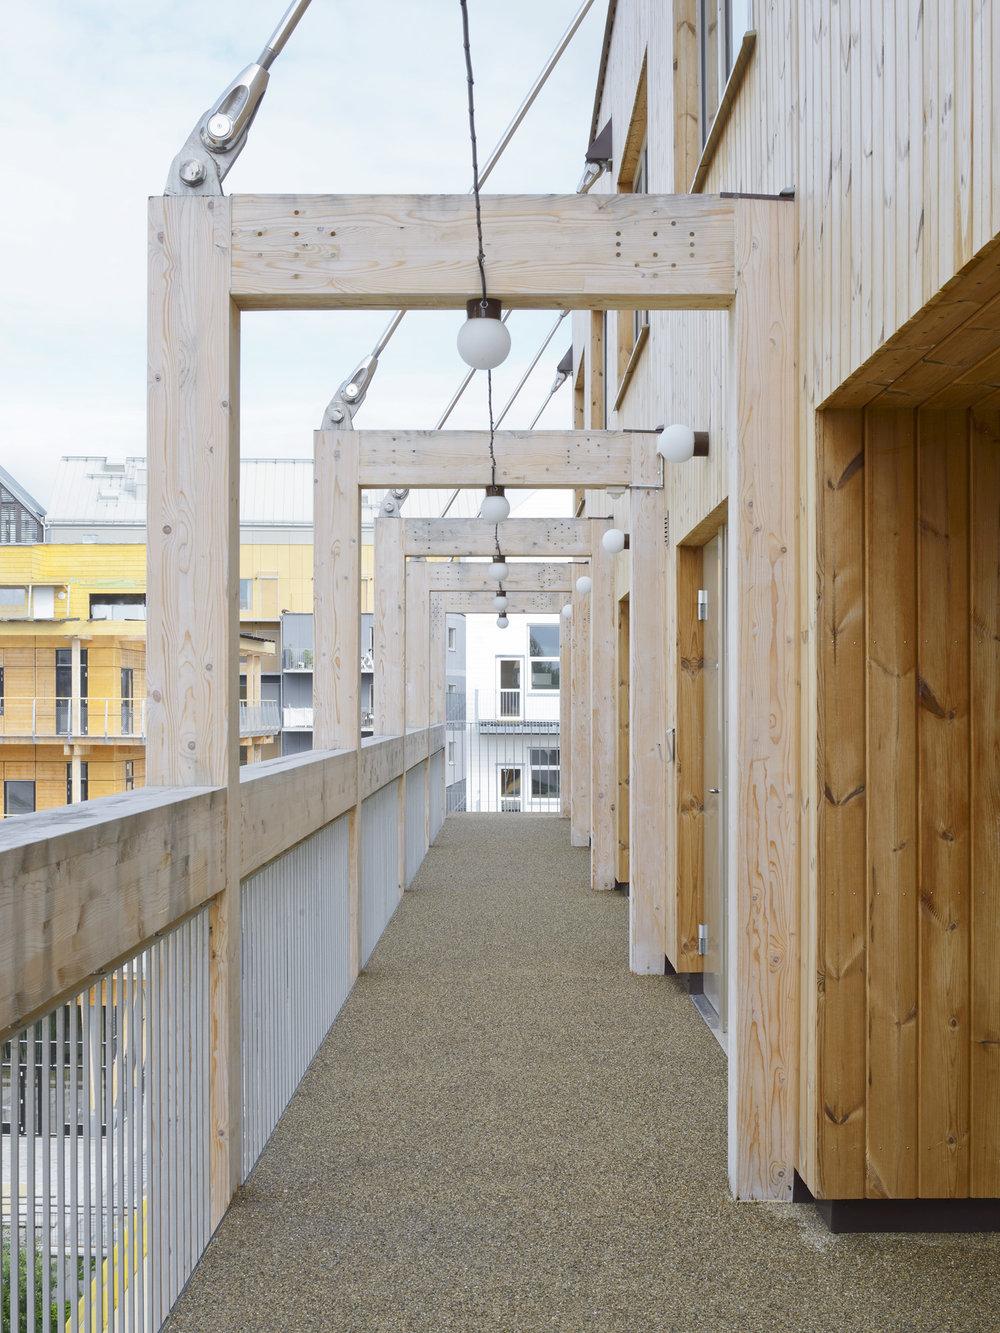 Traloftet-SPRIDD-©MikaelOlsson4225b-2.jpg